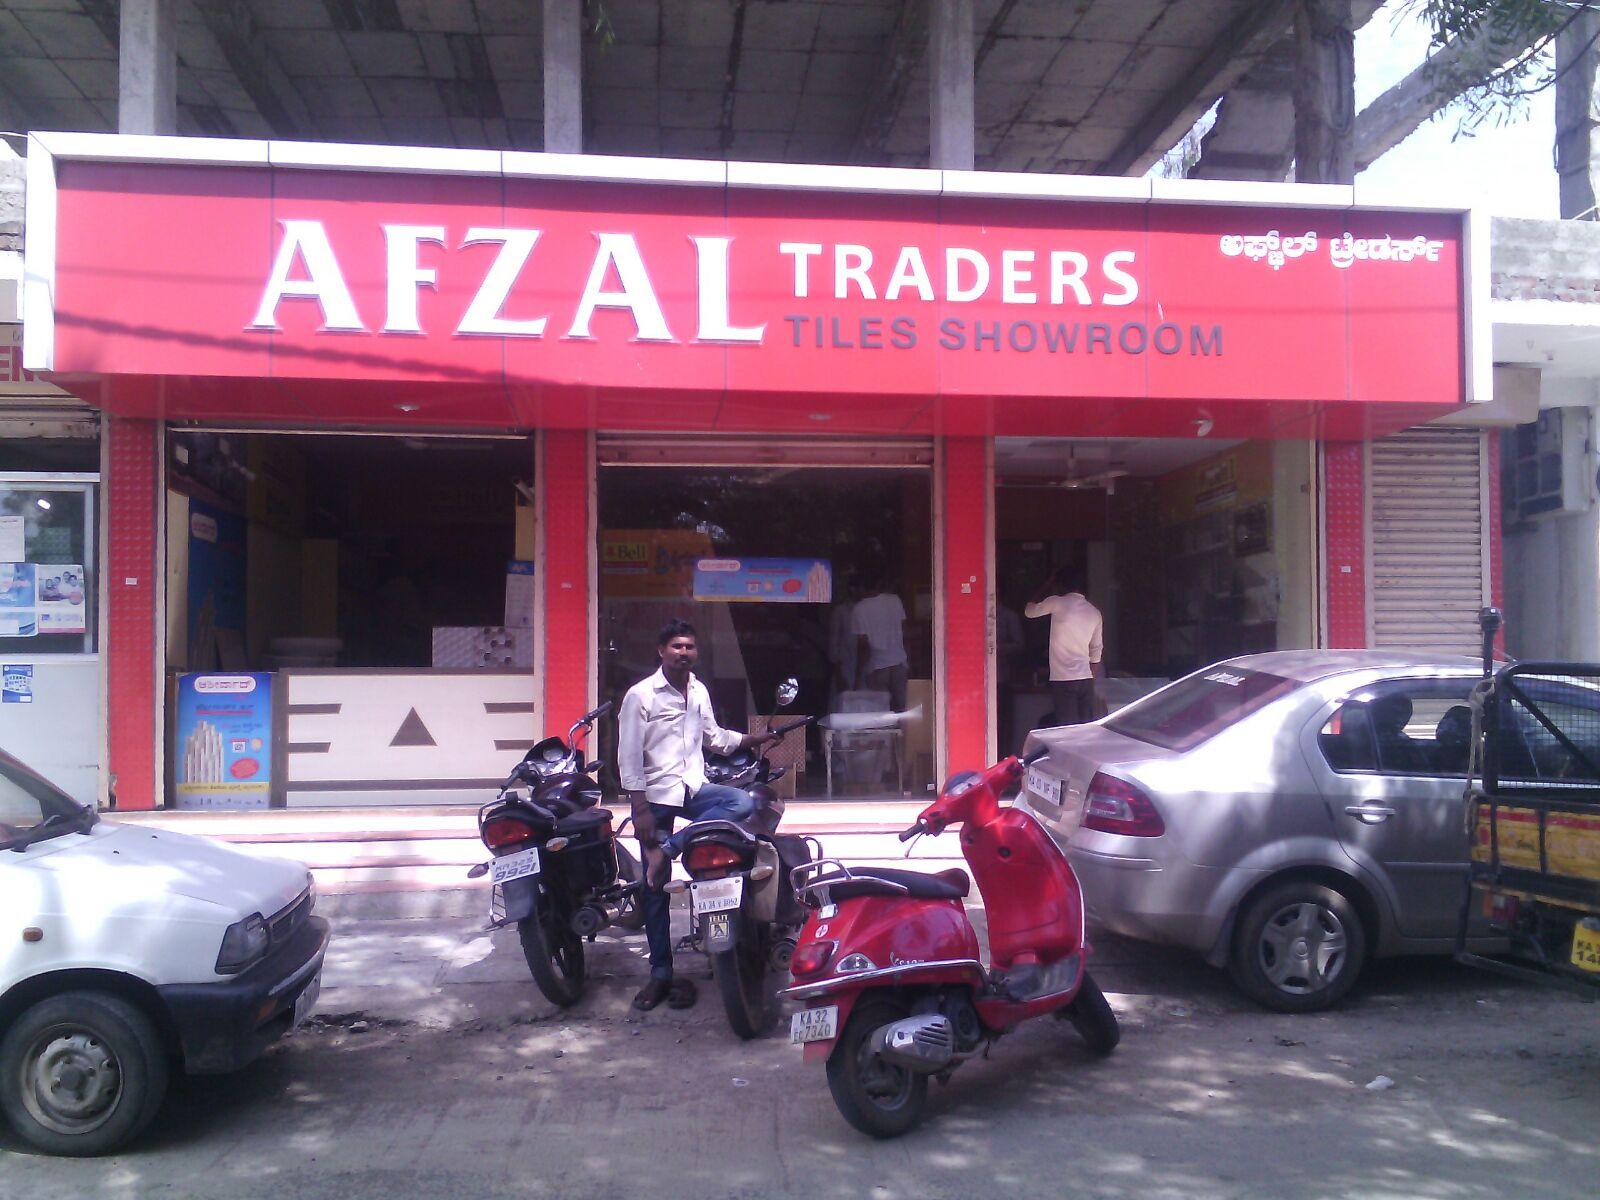 AFZAL TRADERS